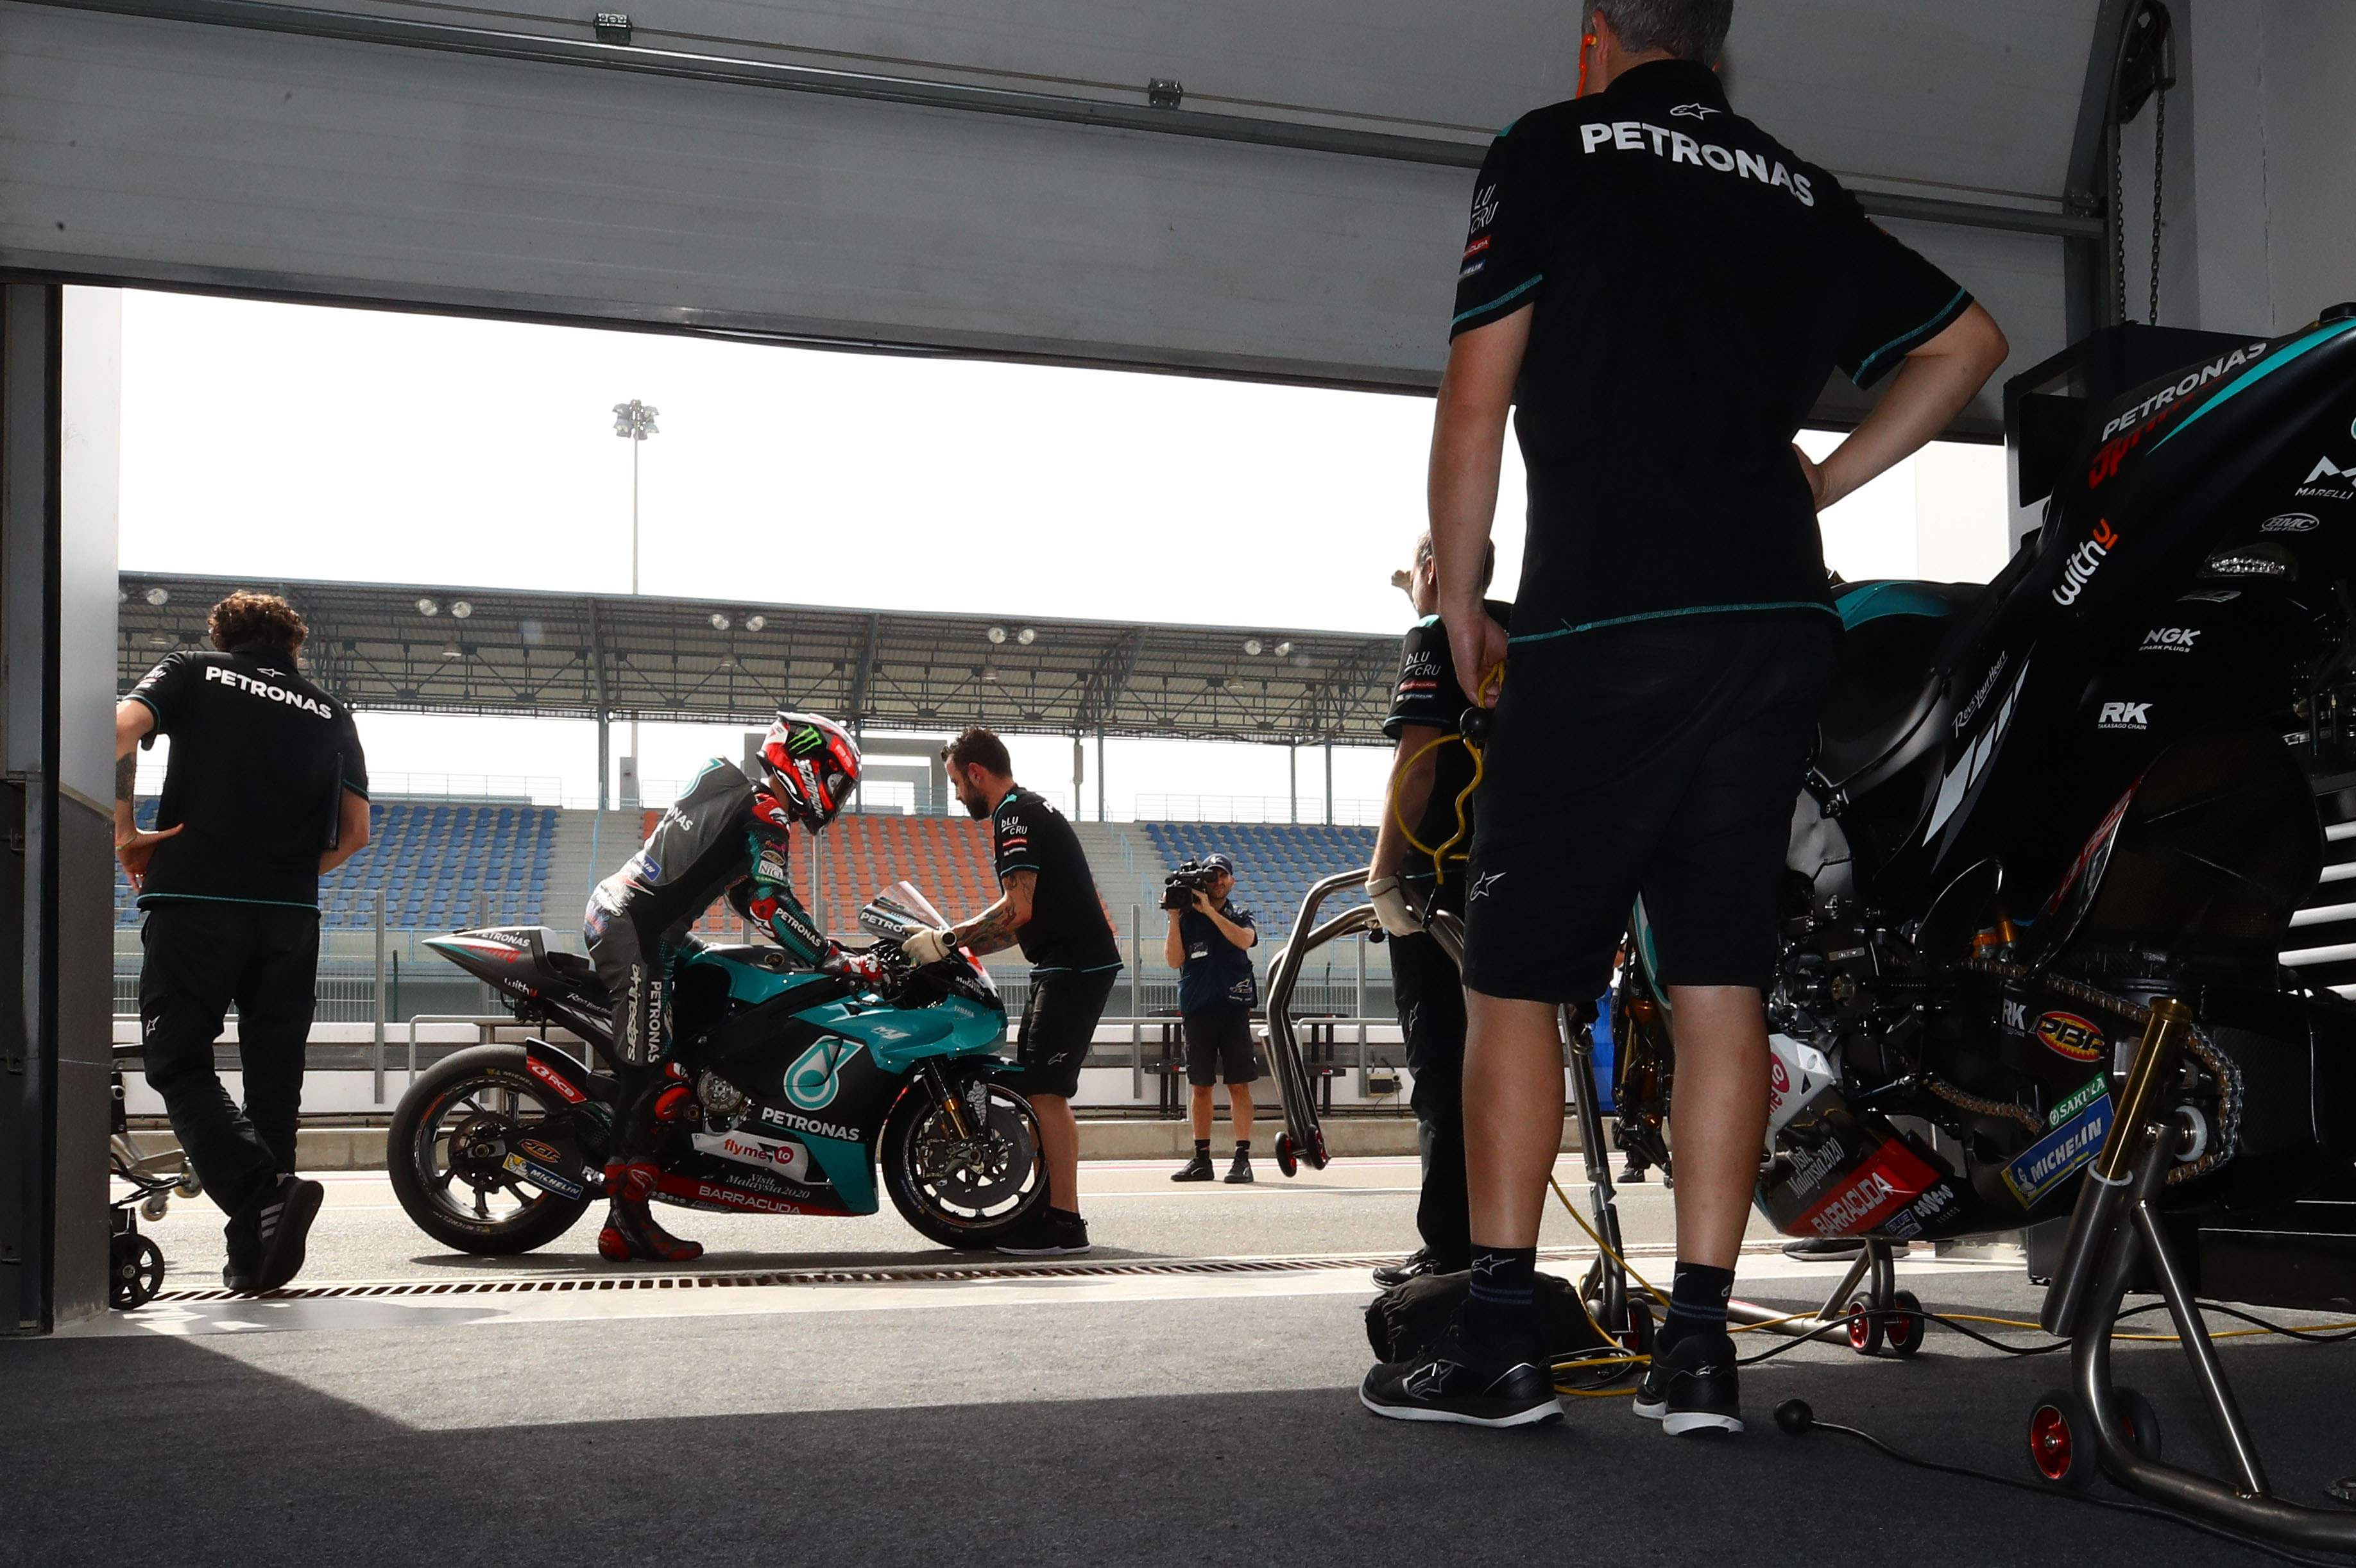 Petronas SRT garage